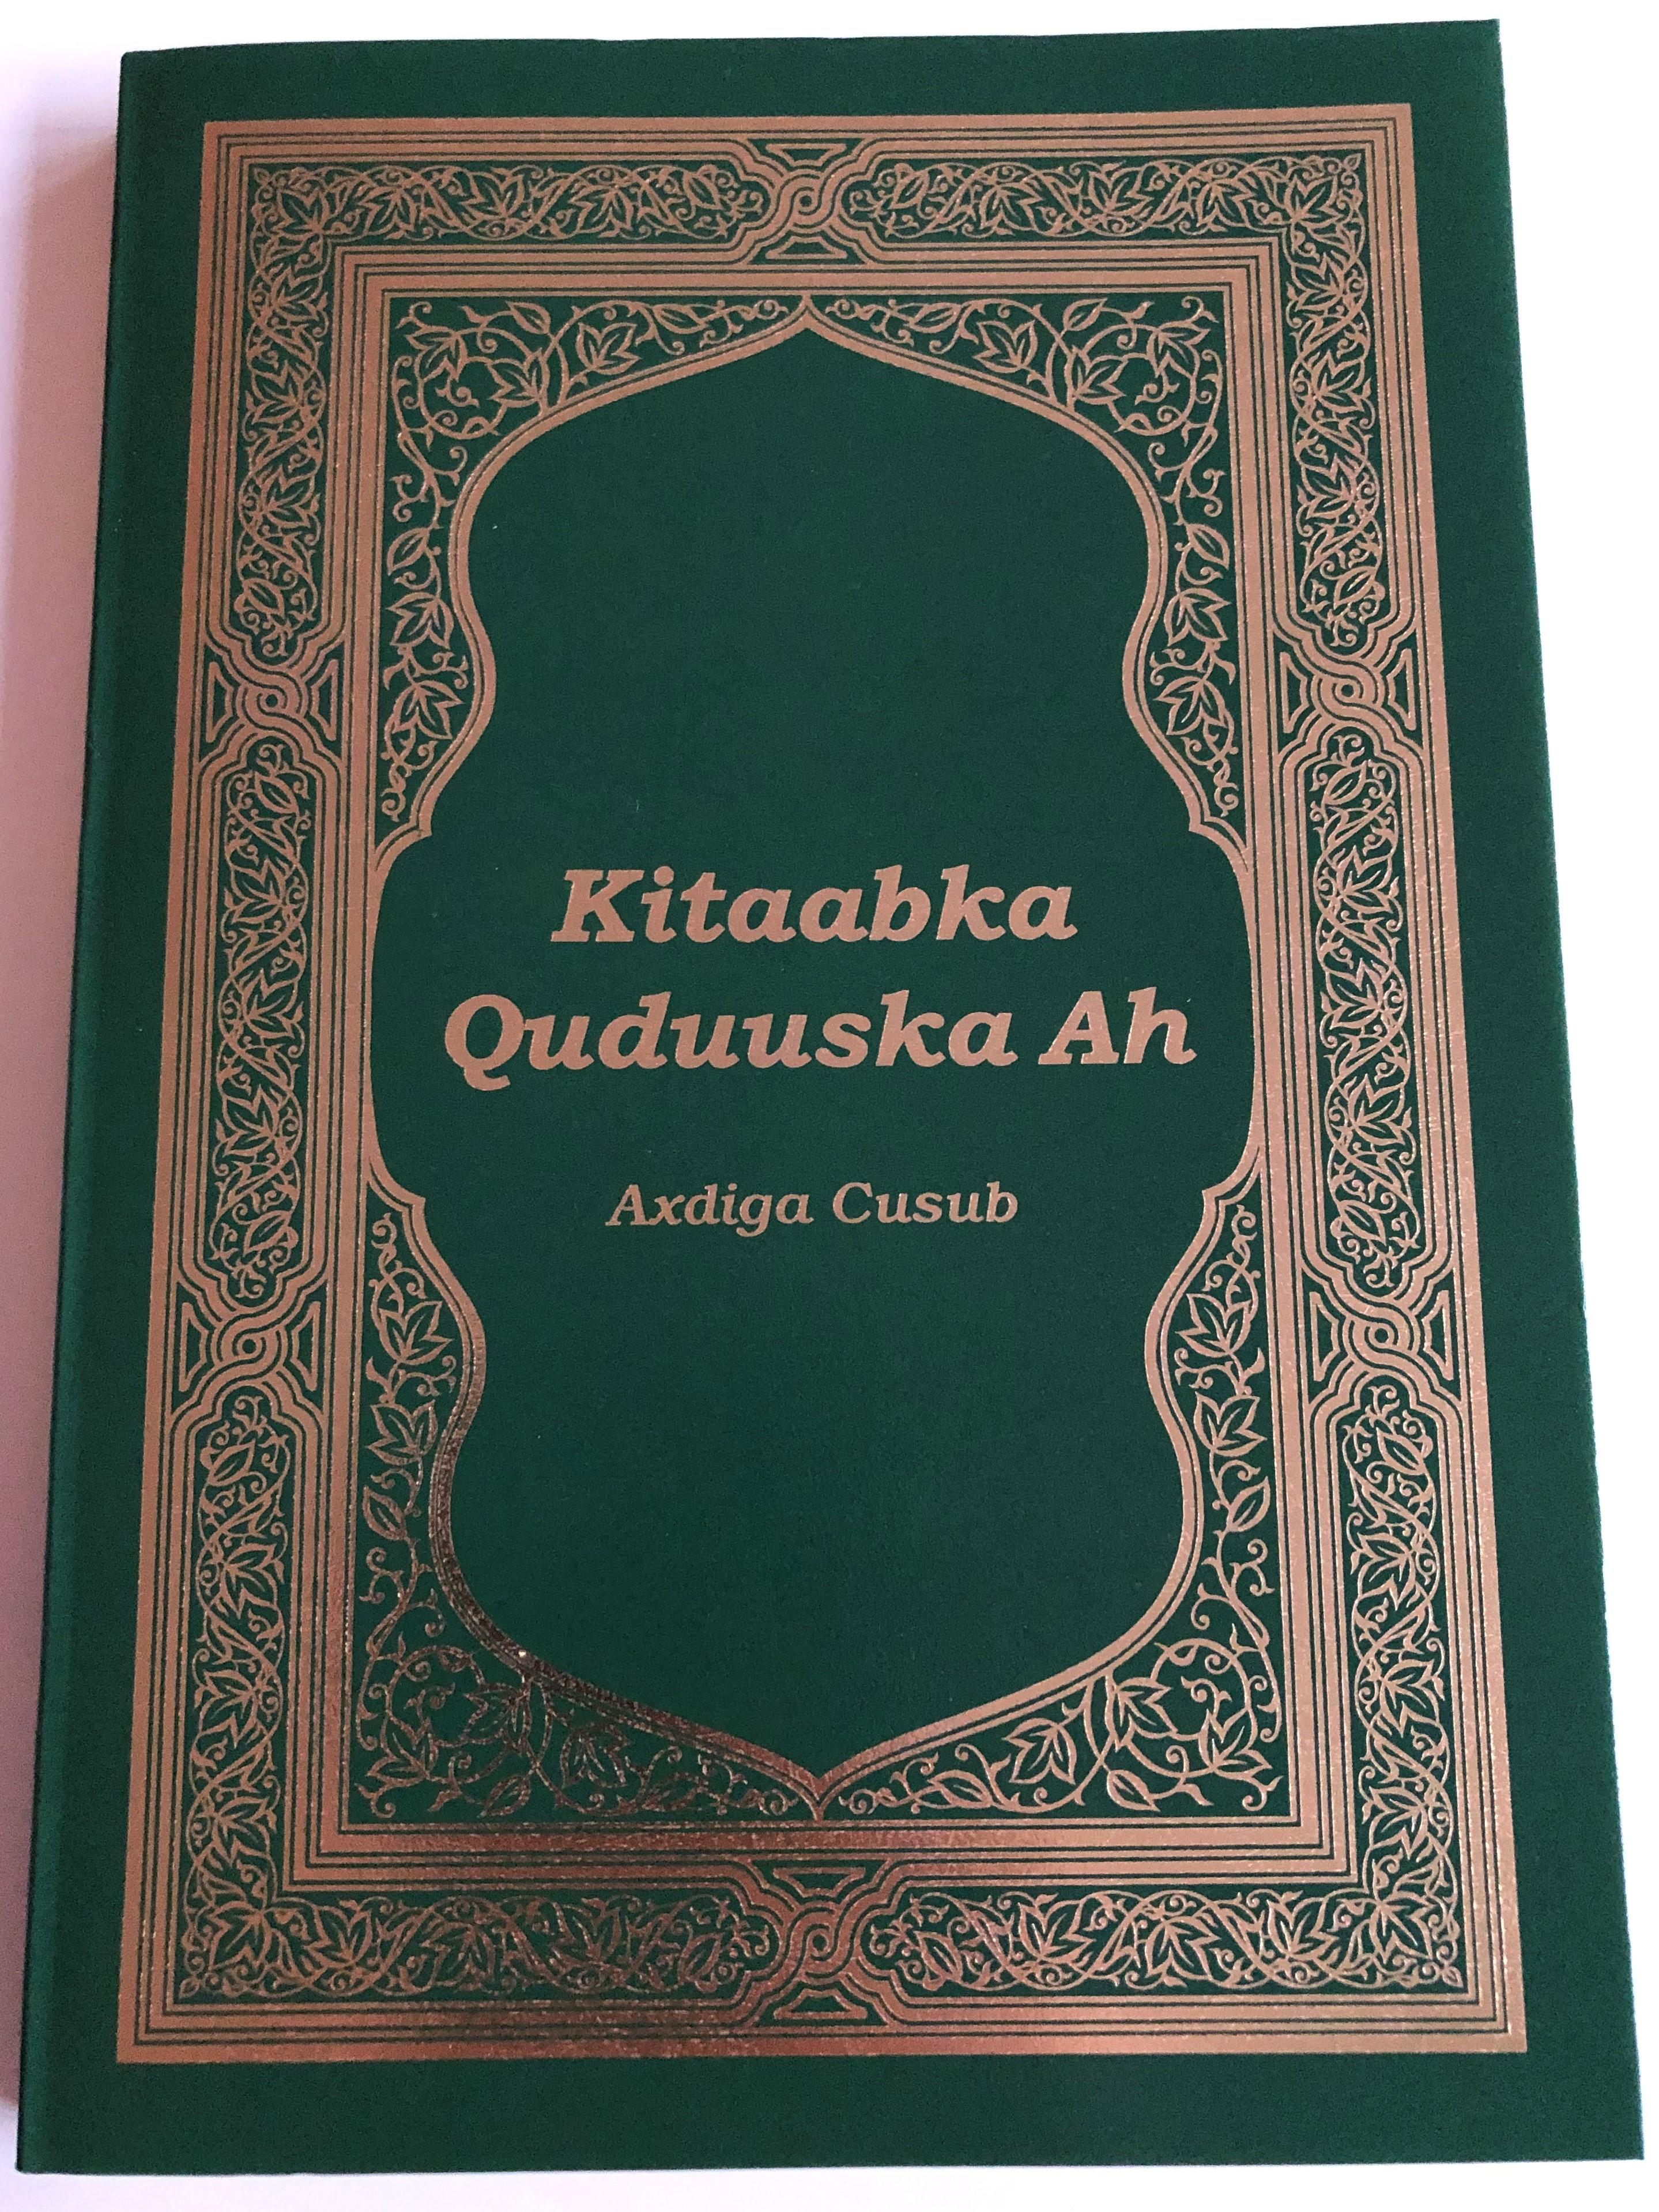 somali-new-testament-kitaabka-quduuska-ah-1.jpg